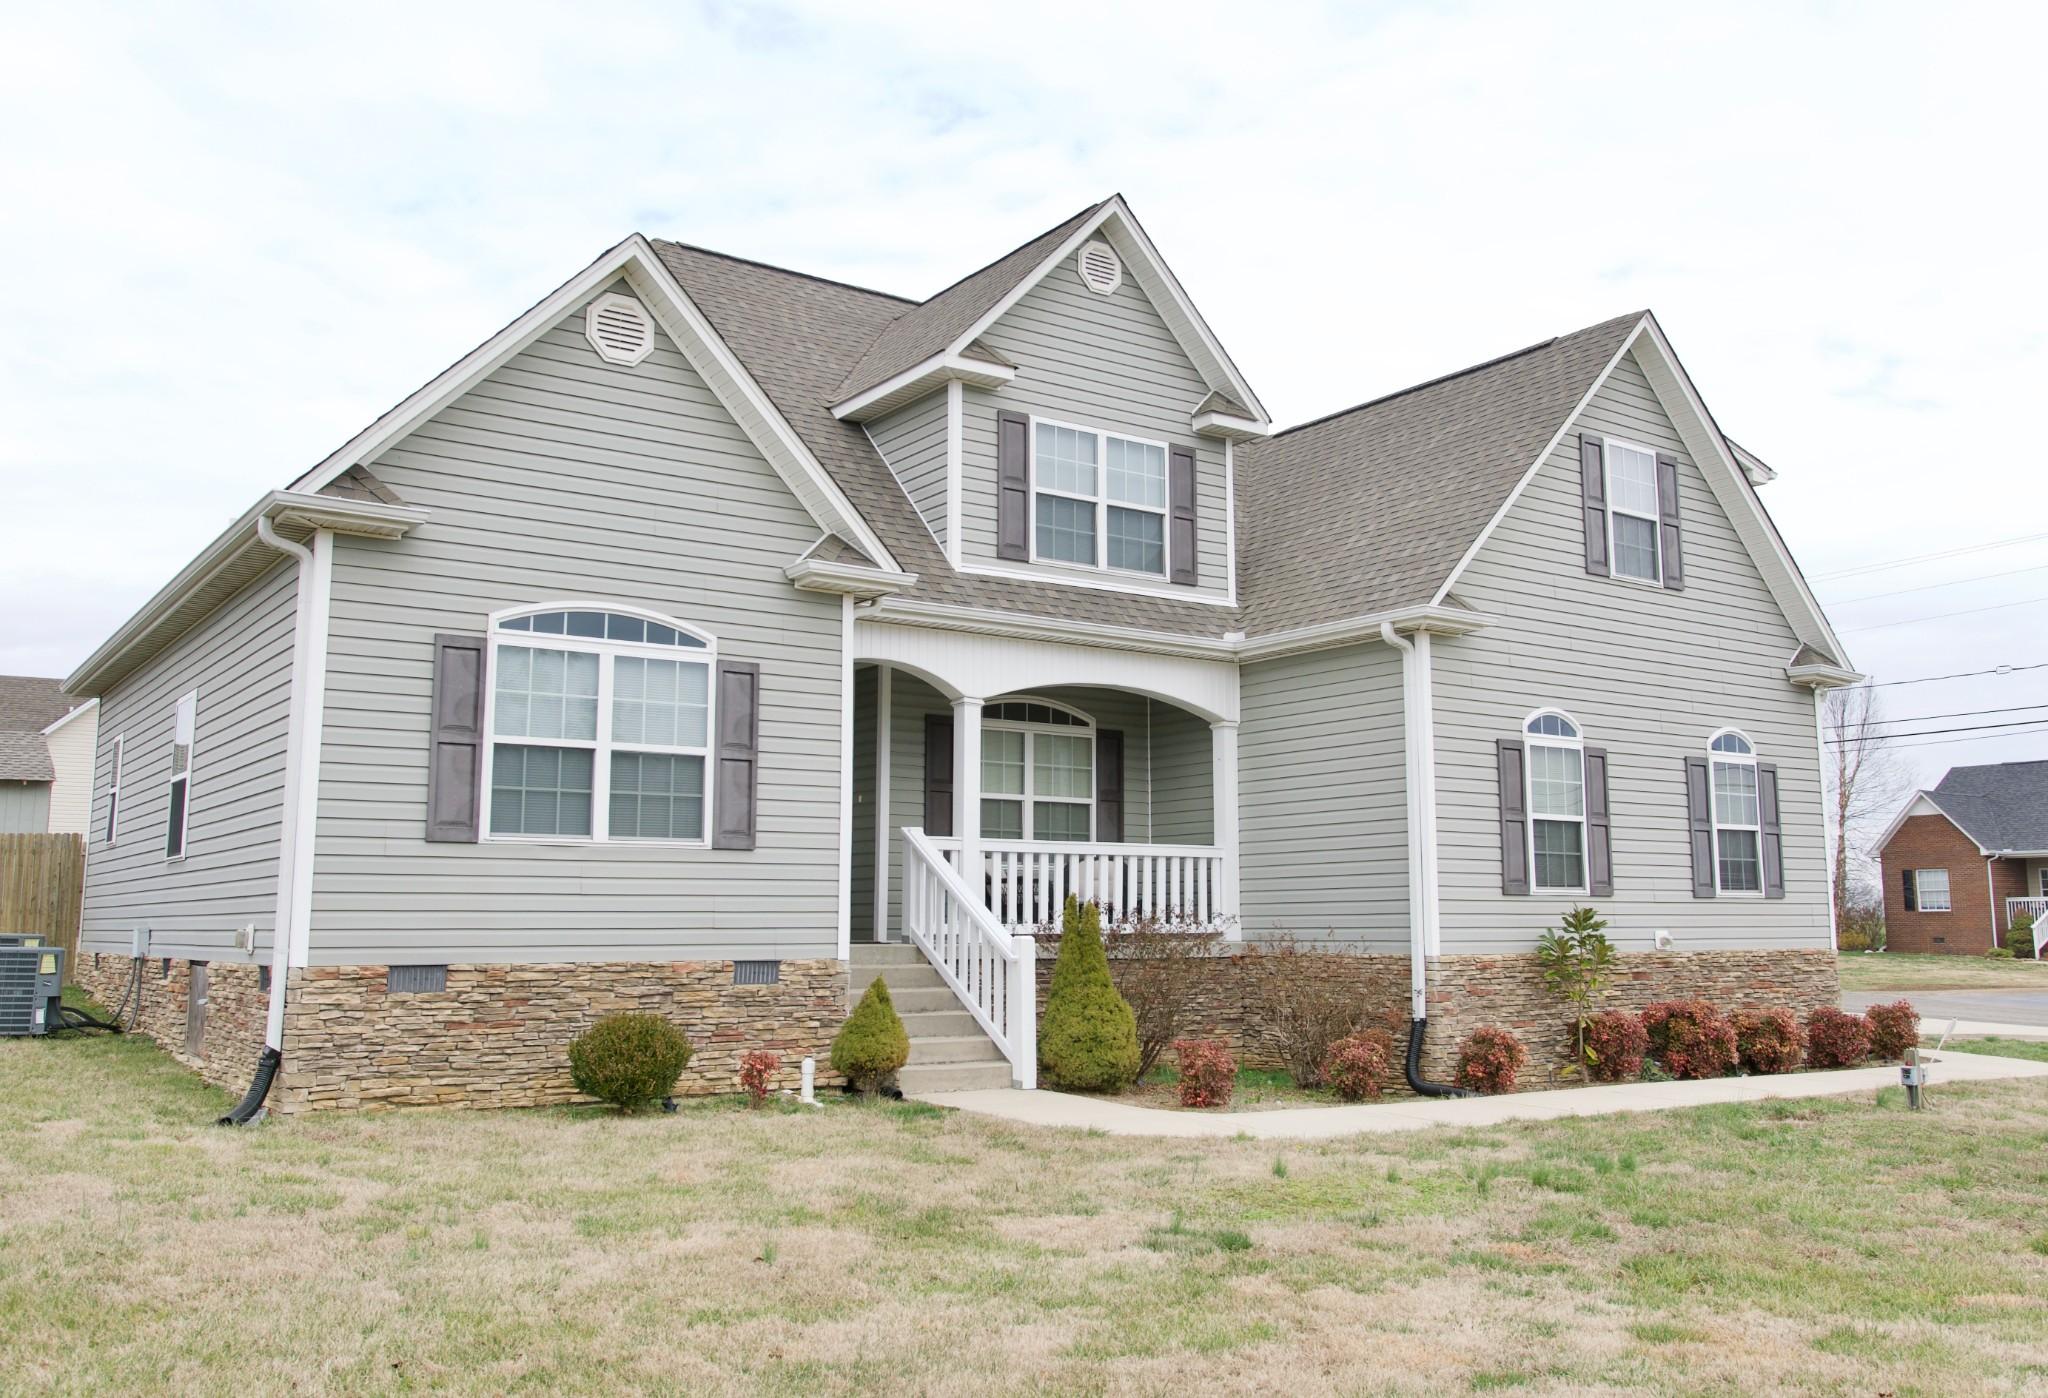 104 Prosperity Dr, W, Baxter, TN 38544 - Baxter, TN real estate listing